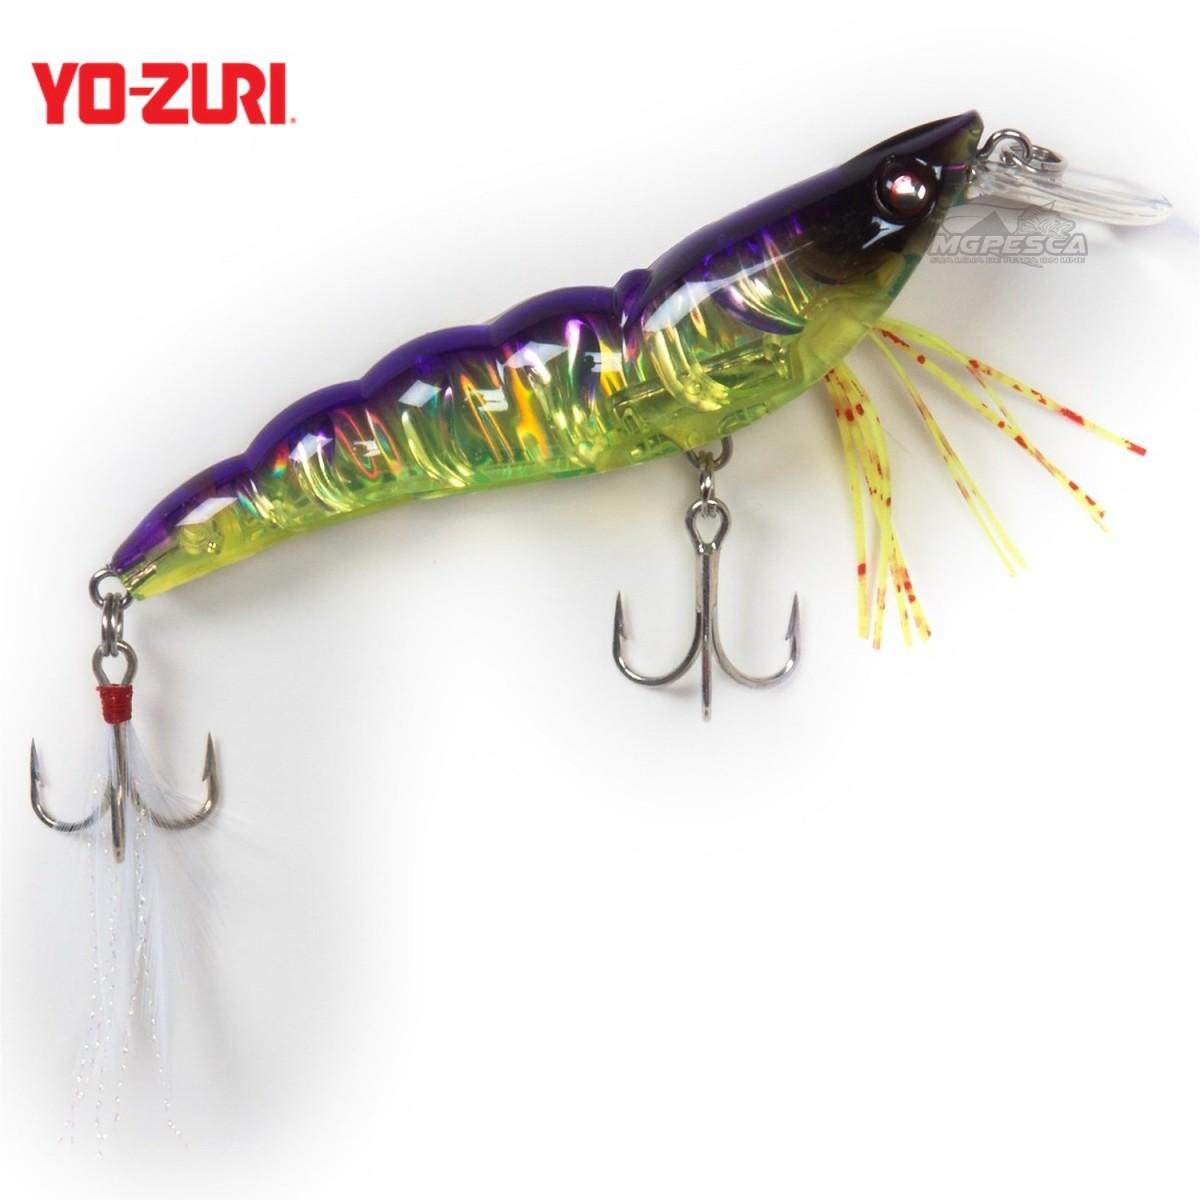 Isca Artificial Yo-Zuri Crystal 3D Shrimp (SS) 70 - F1161  - MGPesca